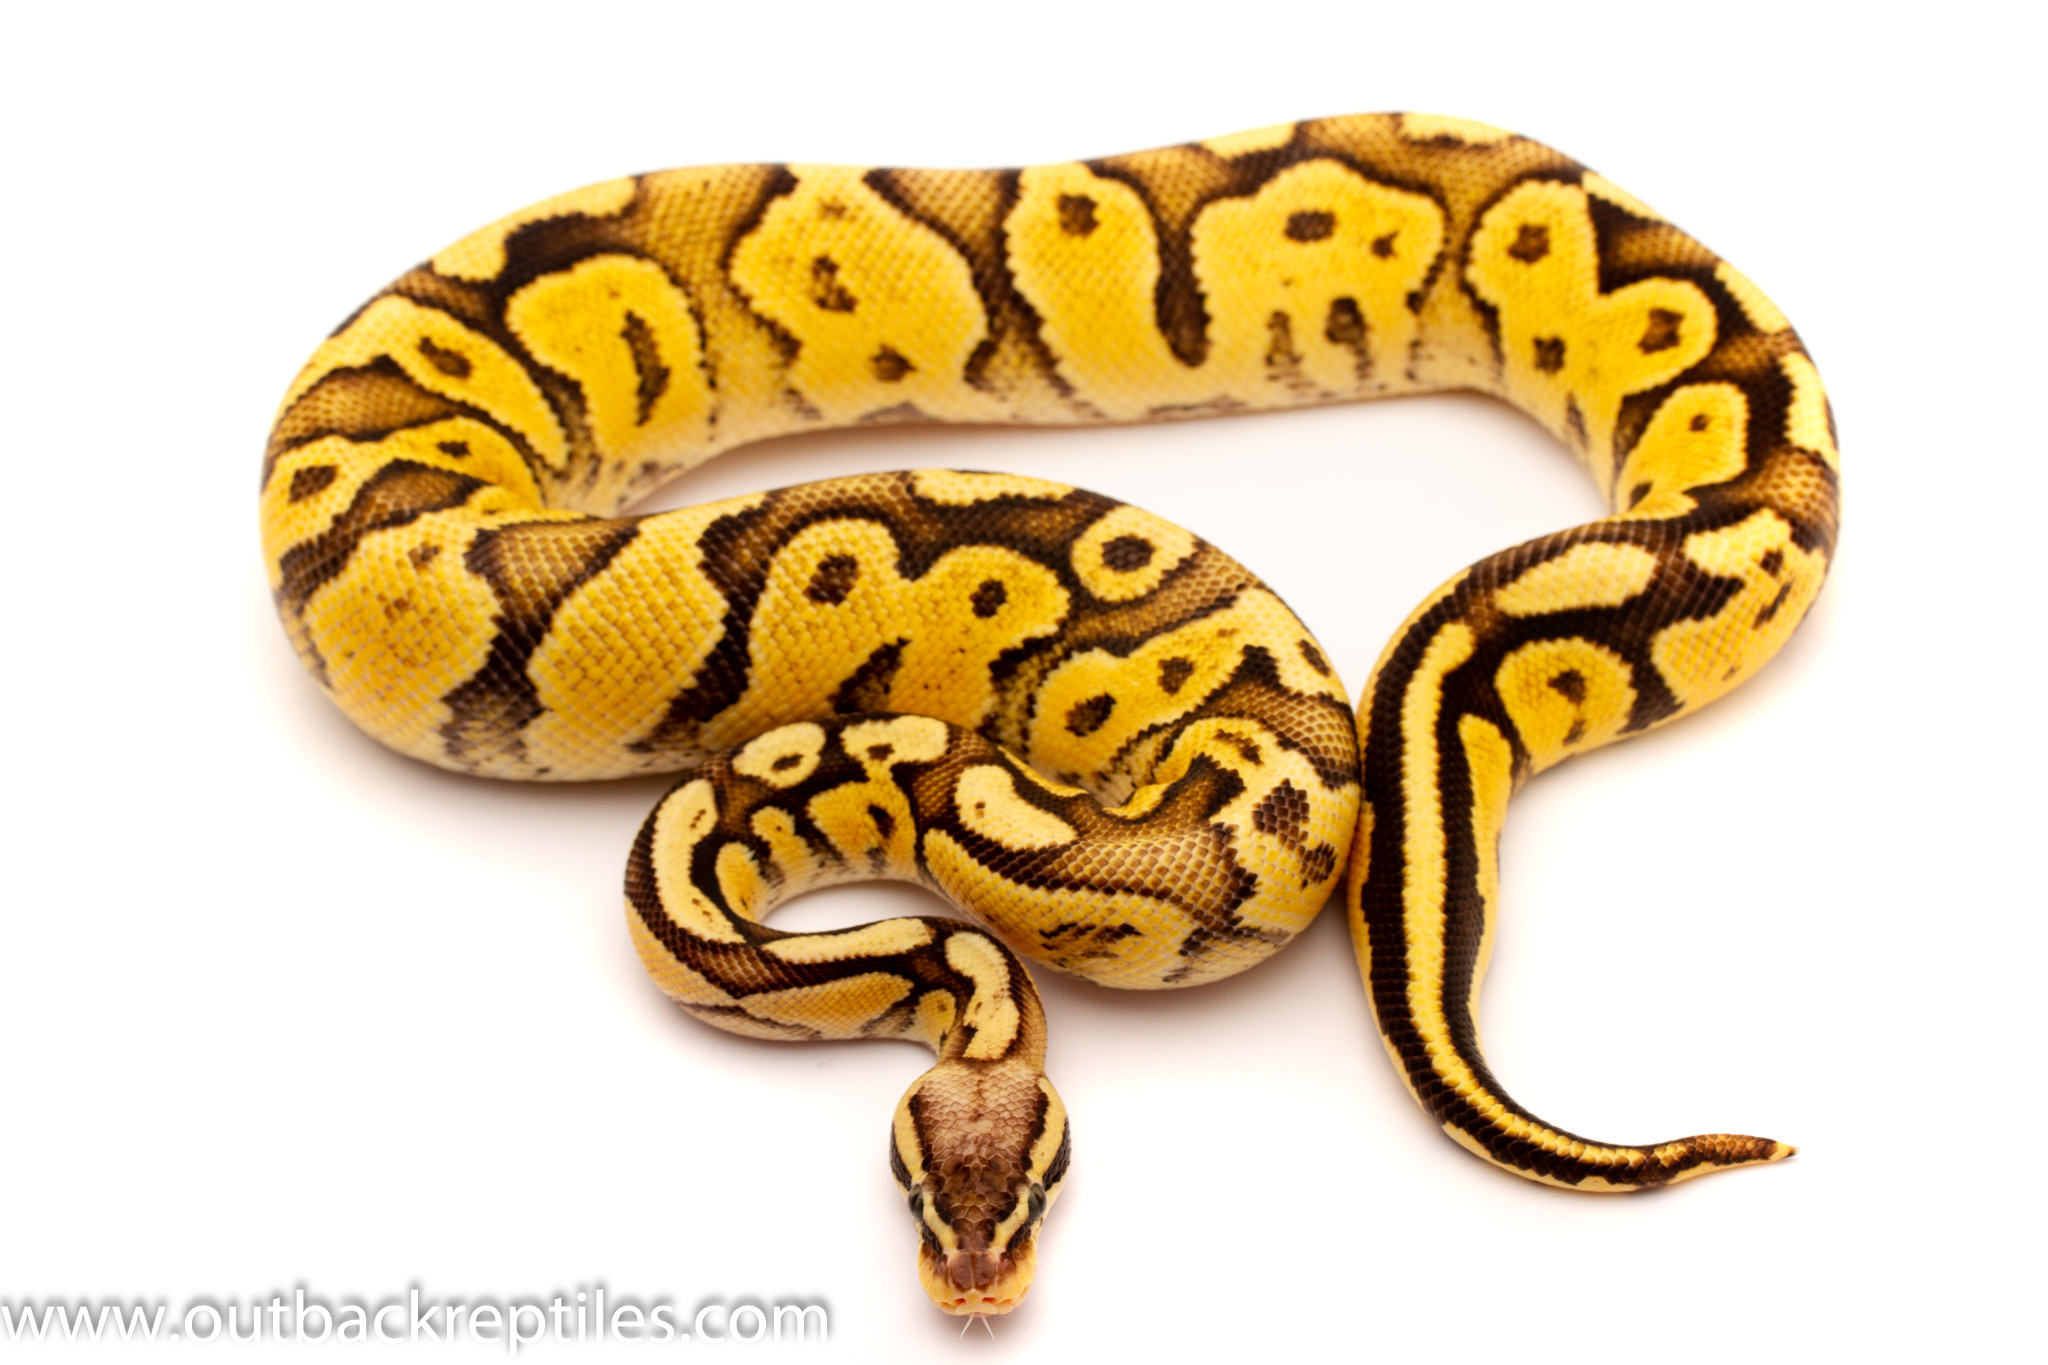 Firefly Het black axanthic ball python for sale